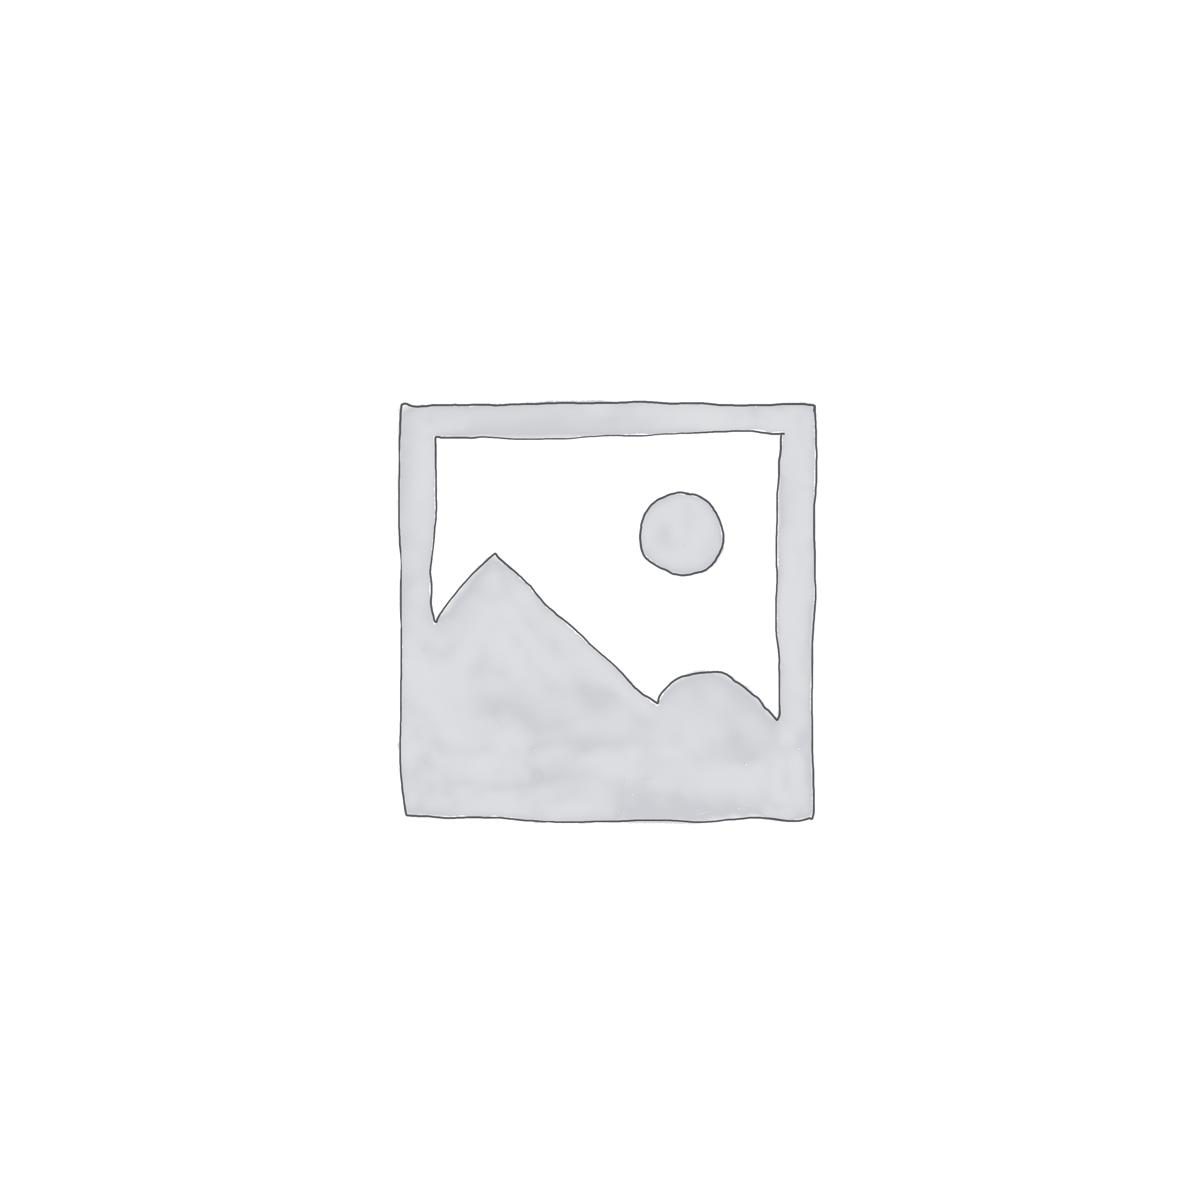 Vintage Geometric City Wallpaper Mural